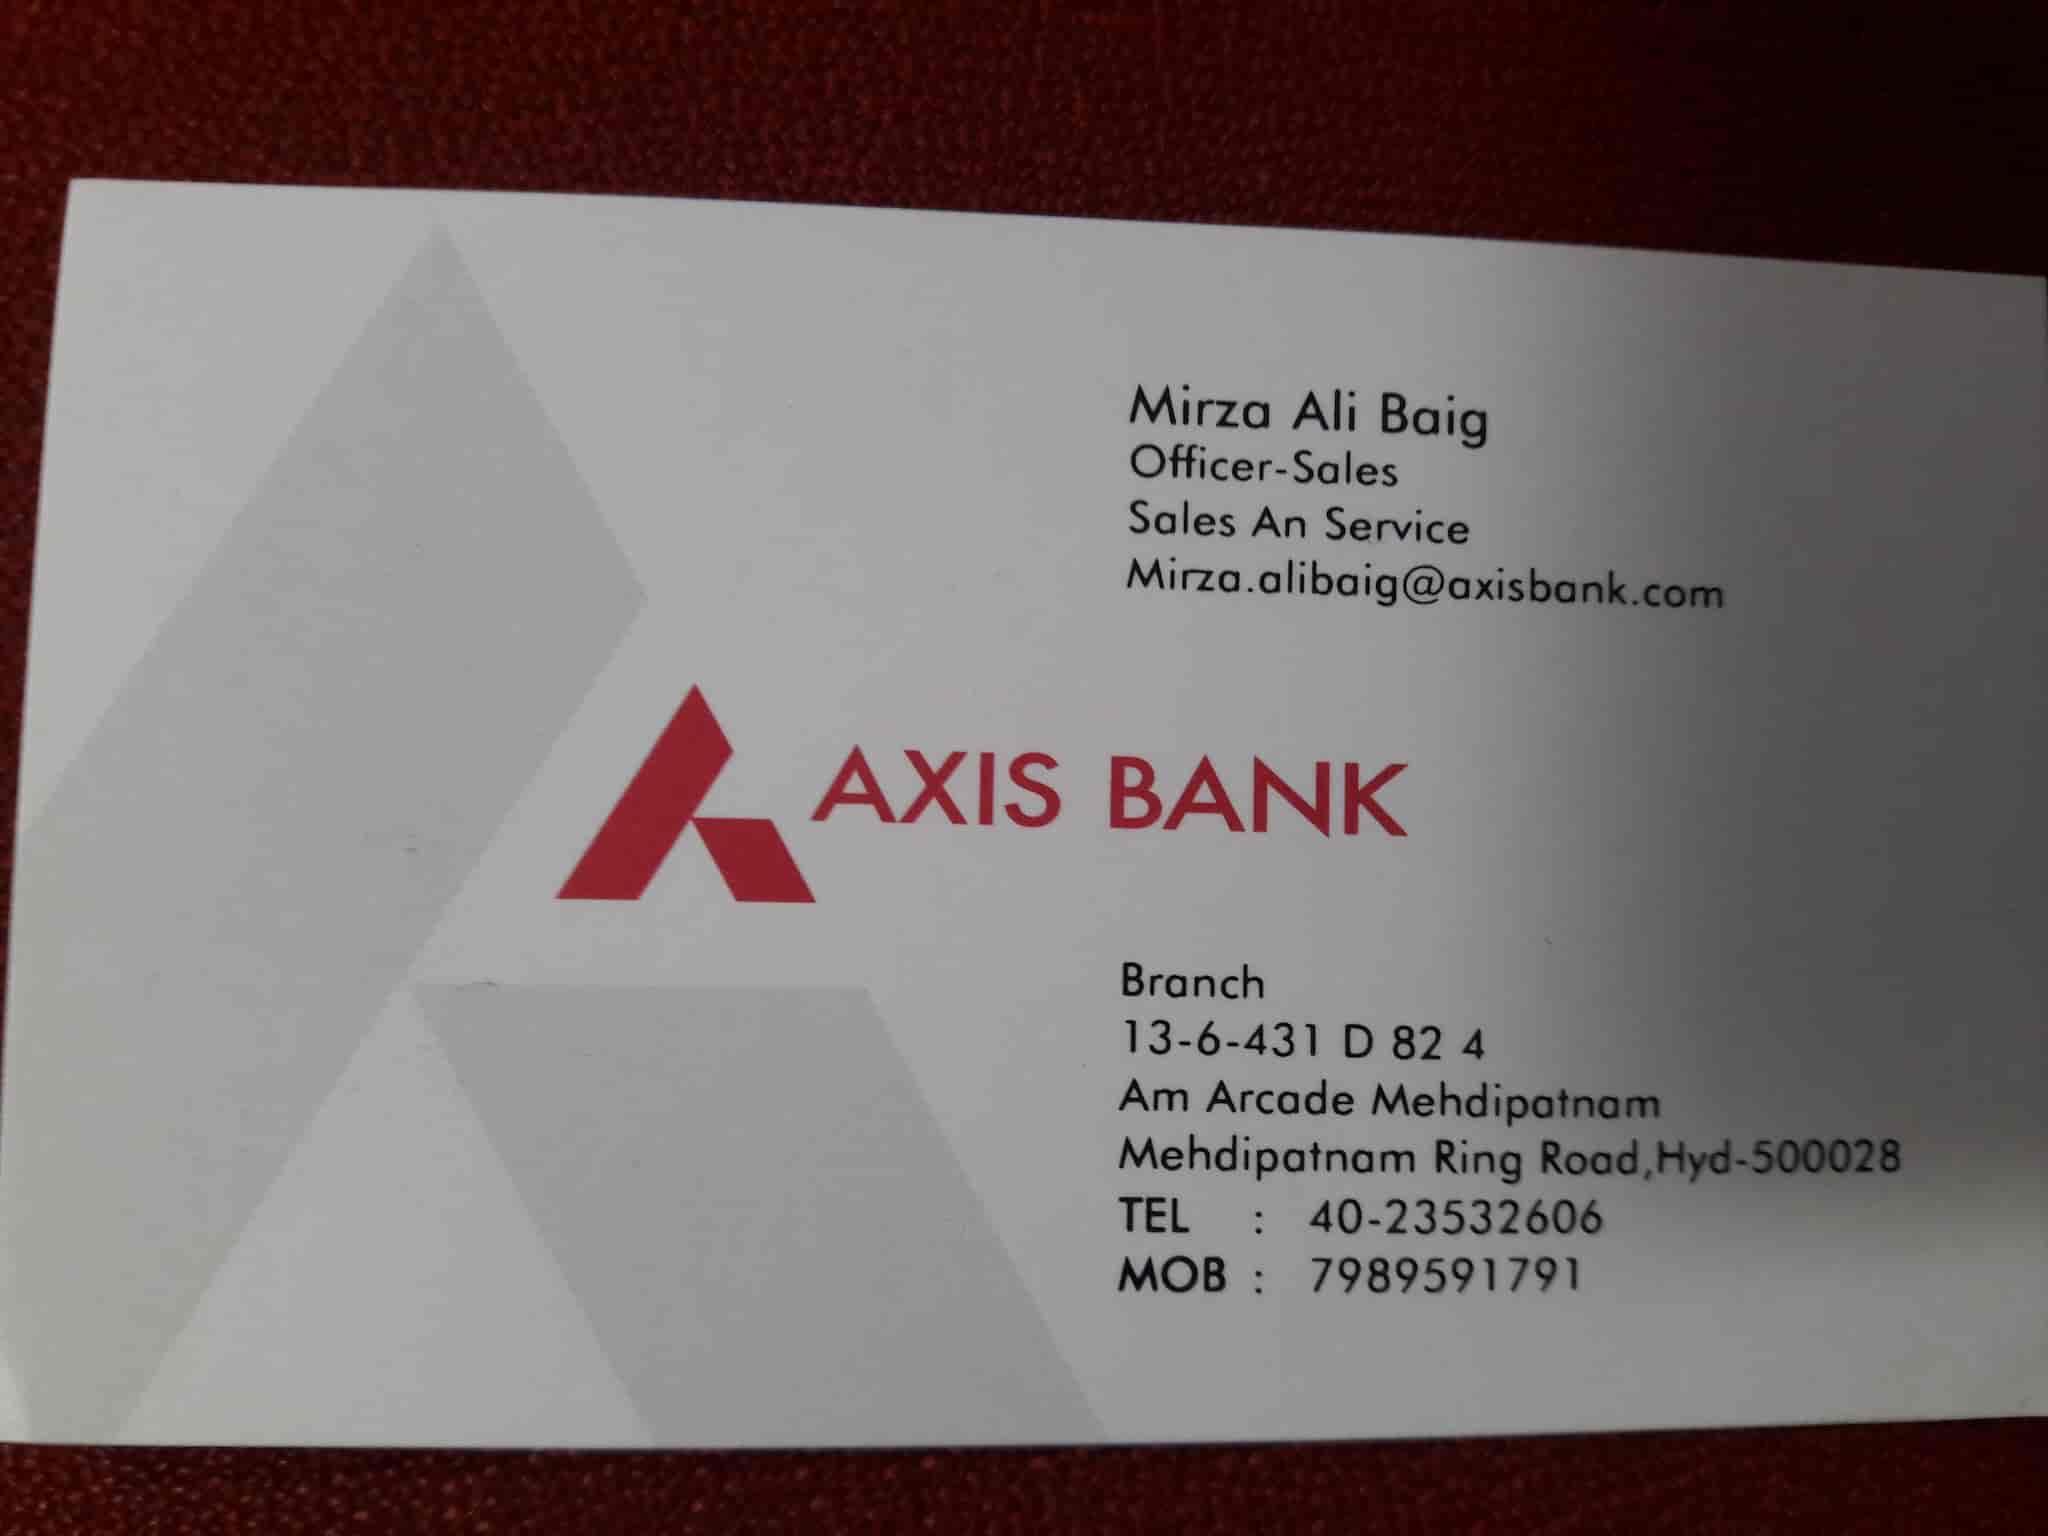 Ramesh Axis Bank Counsultant Photos Mehdipatnam Hyderabad